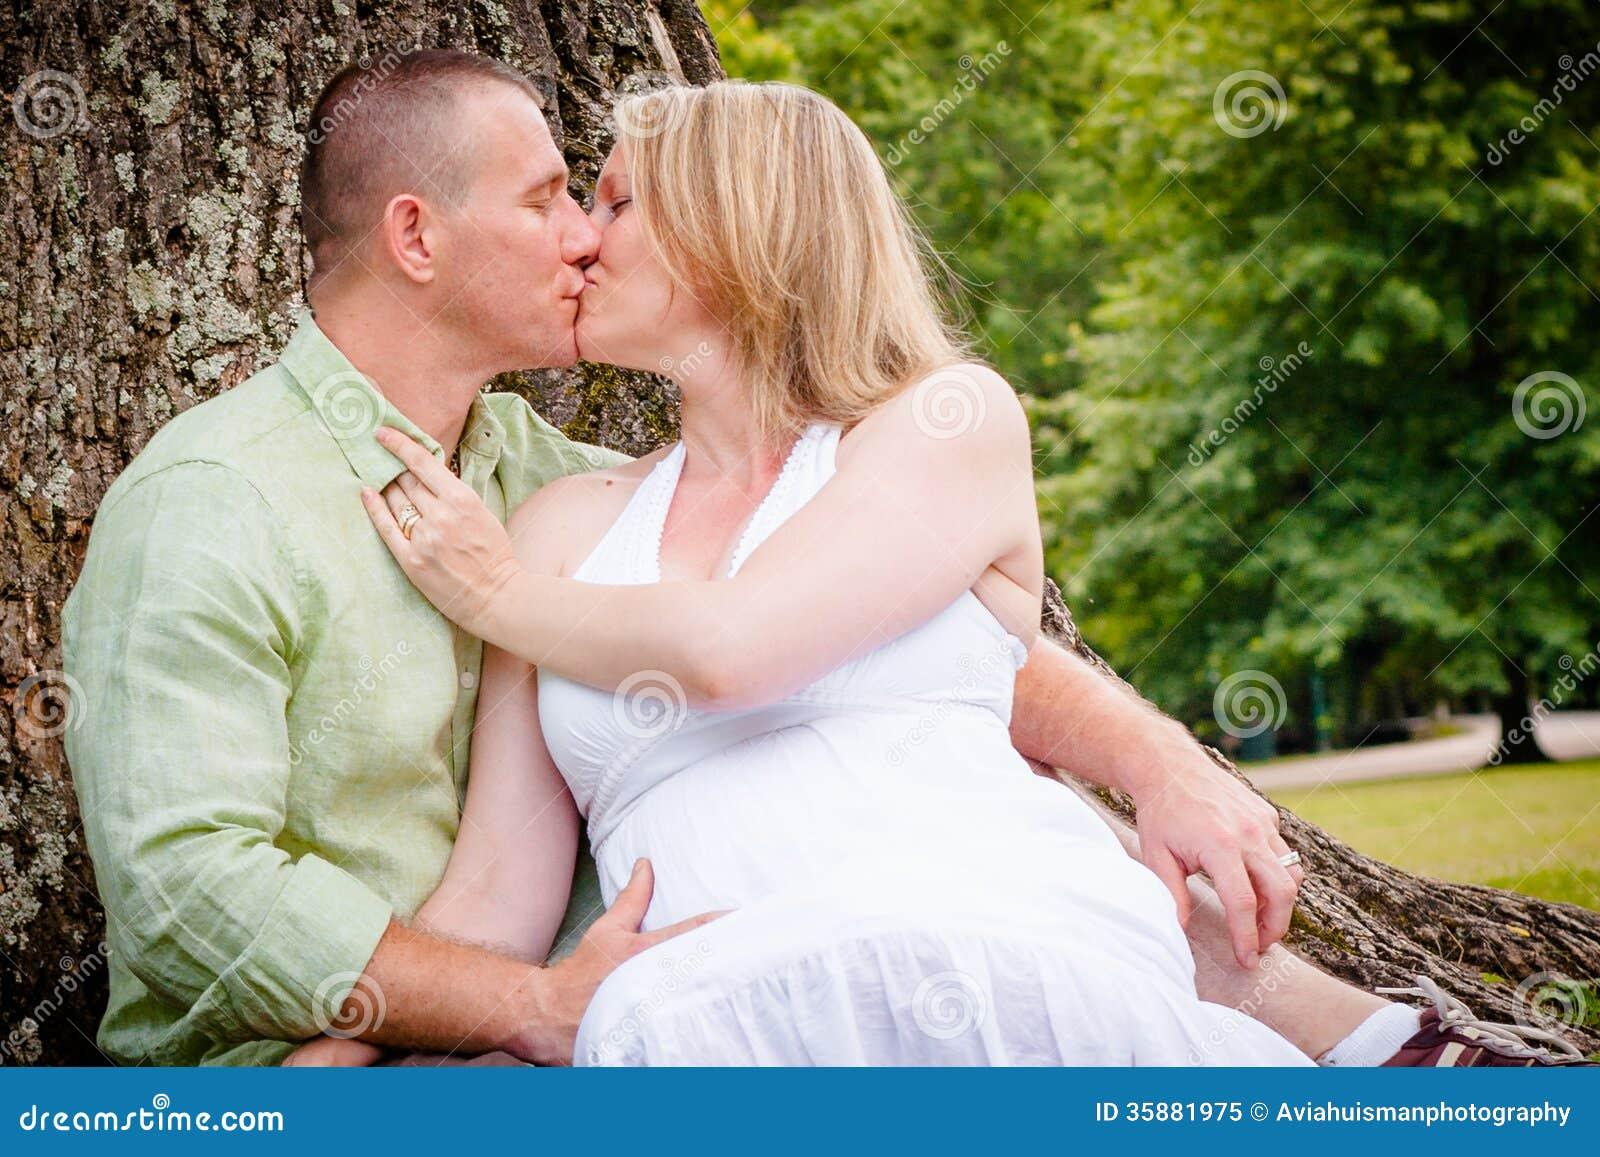 women love kissing